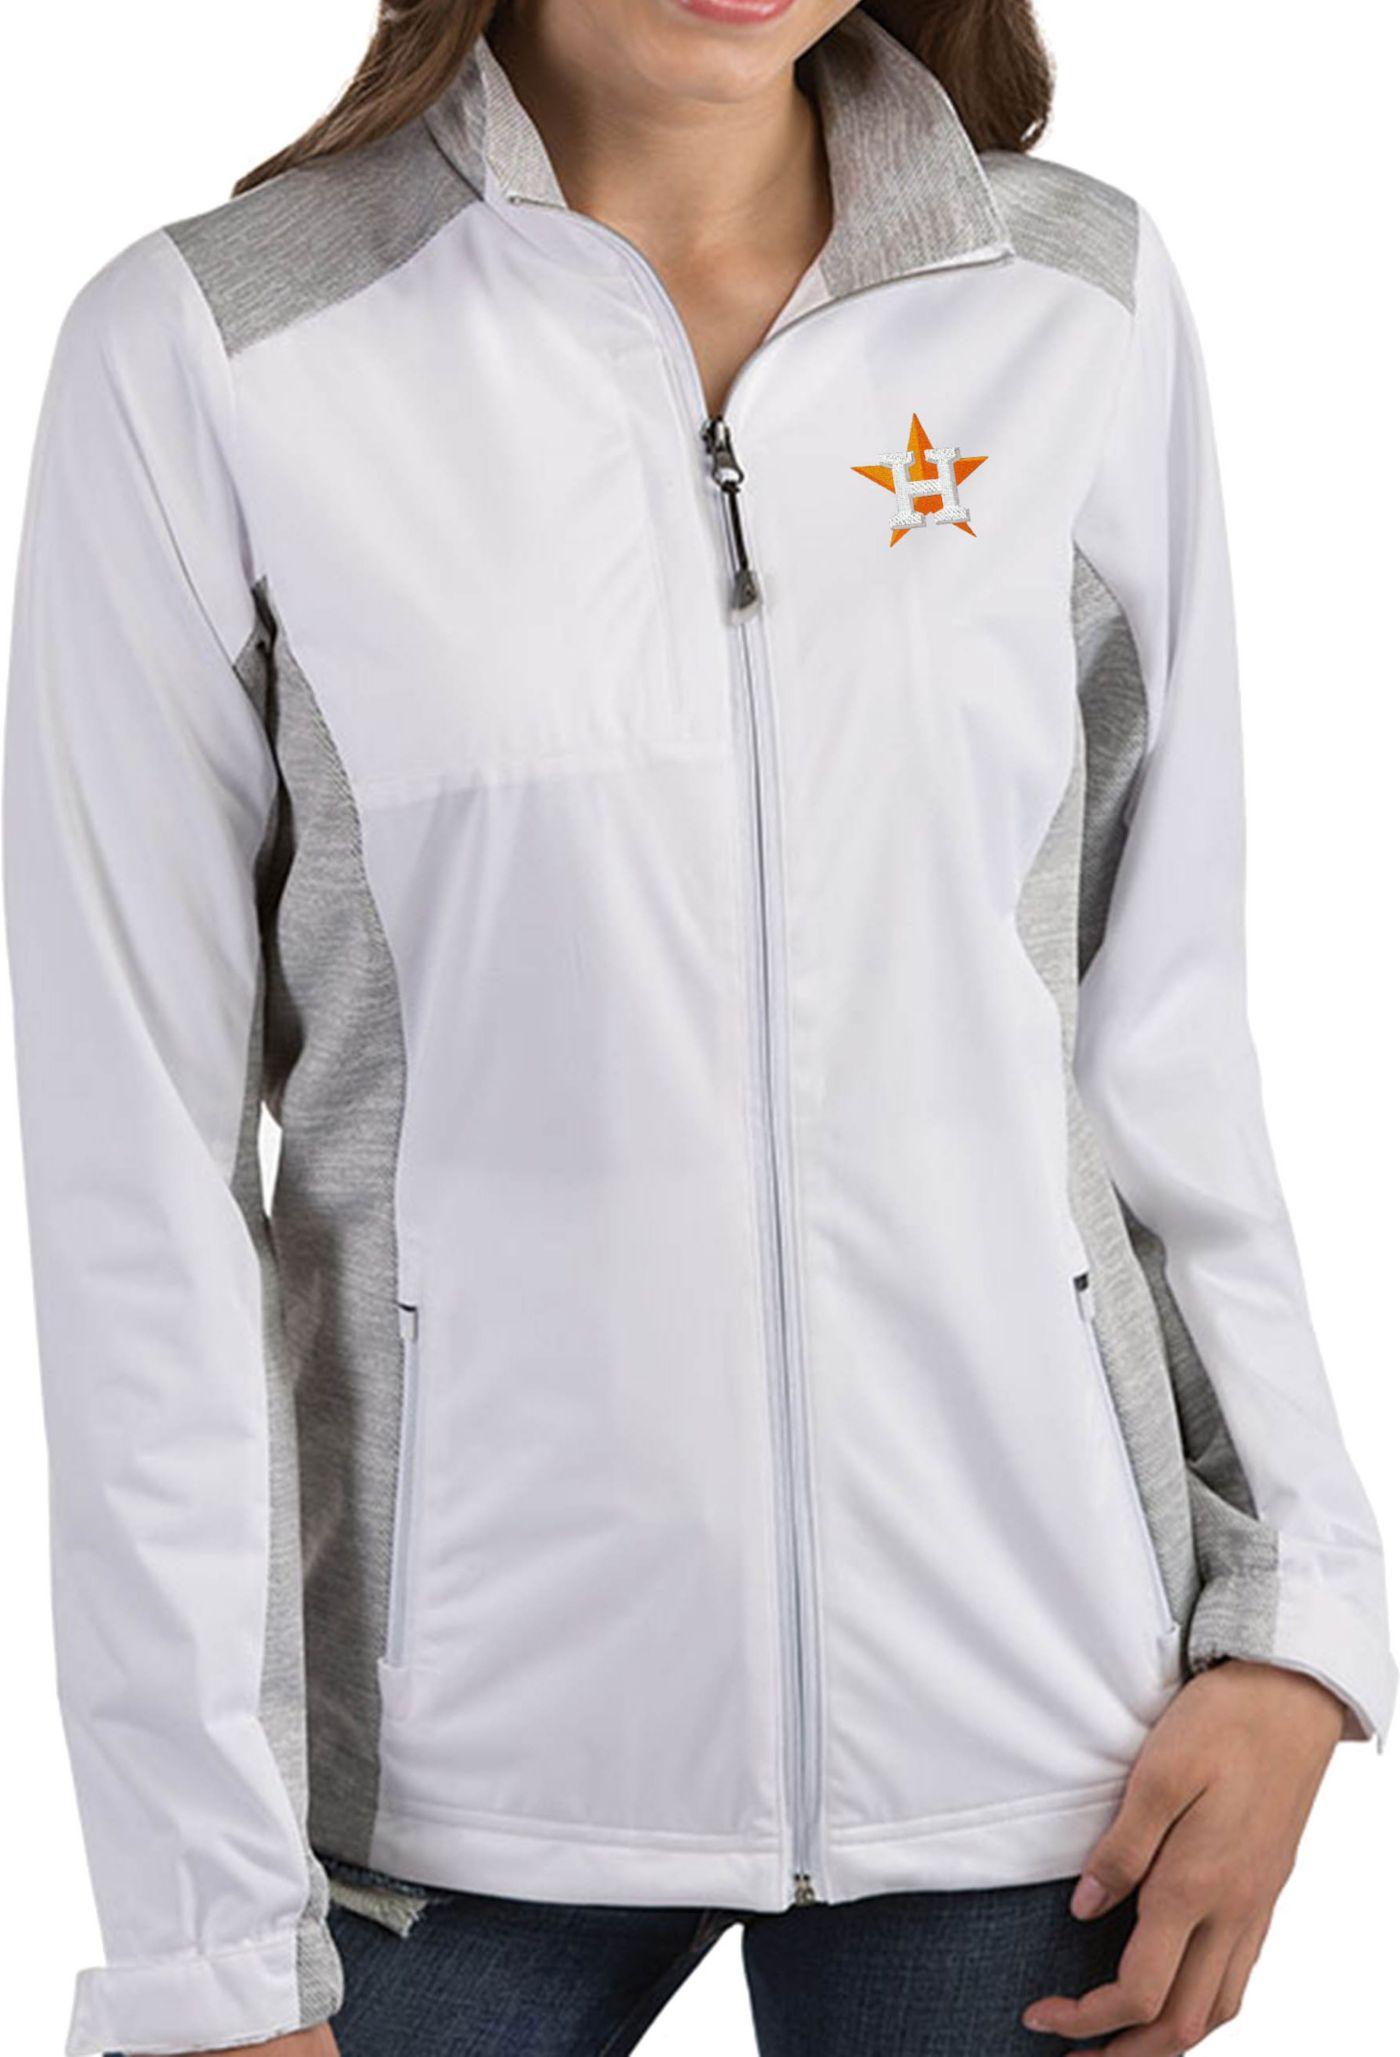 Antigua Women's Houston Astros Revolve White Full-Zip Jacket